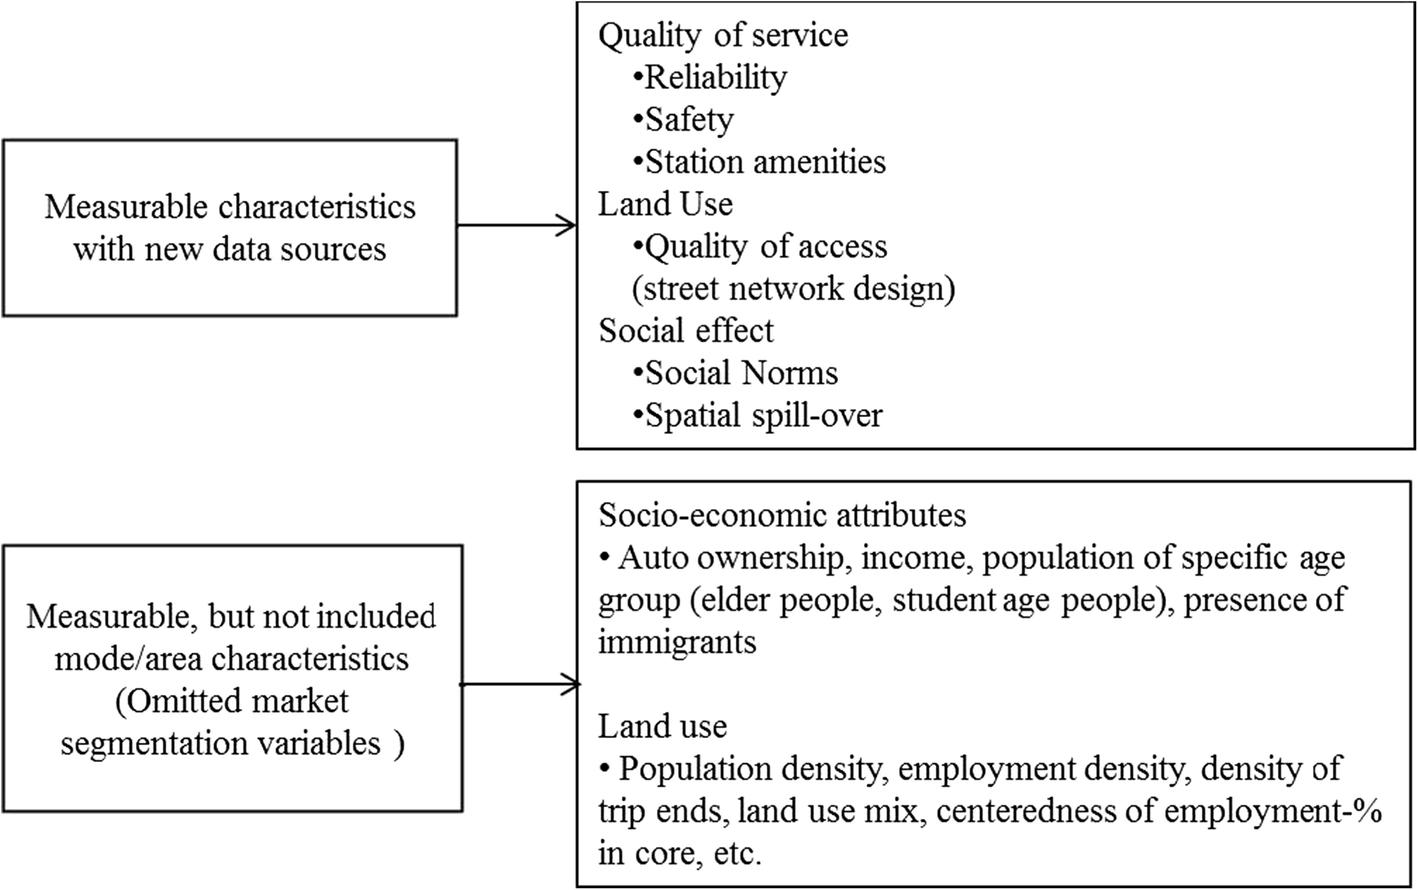 Assessment of the transit ridership prediction errors using AVL/APC